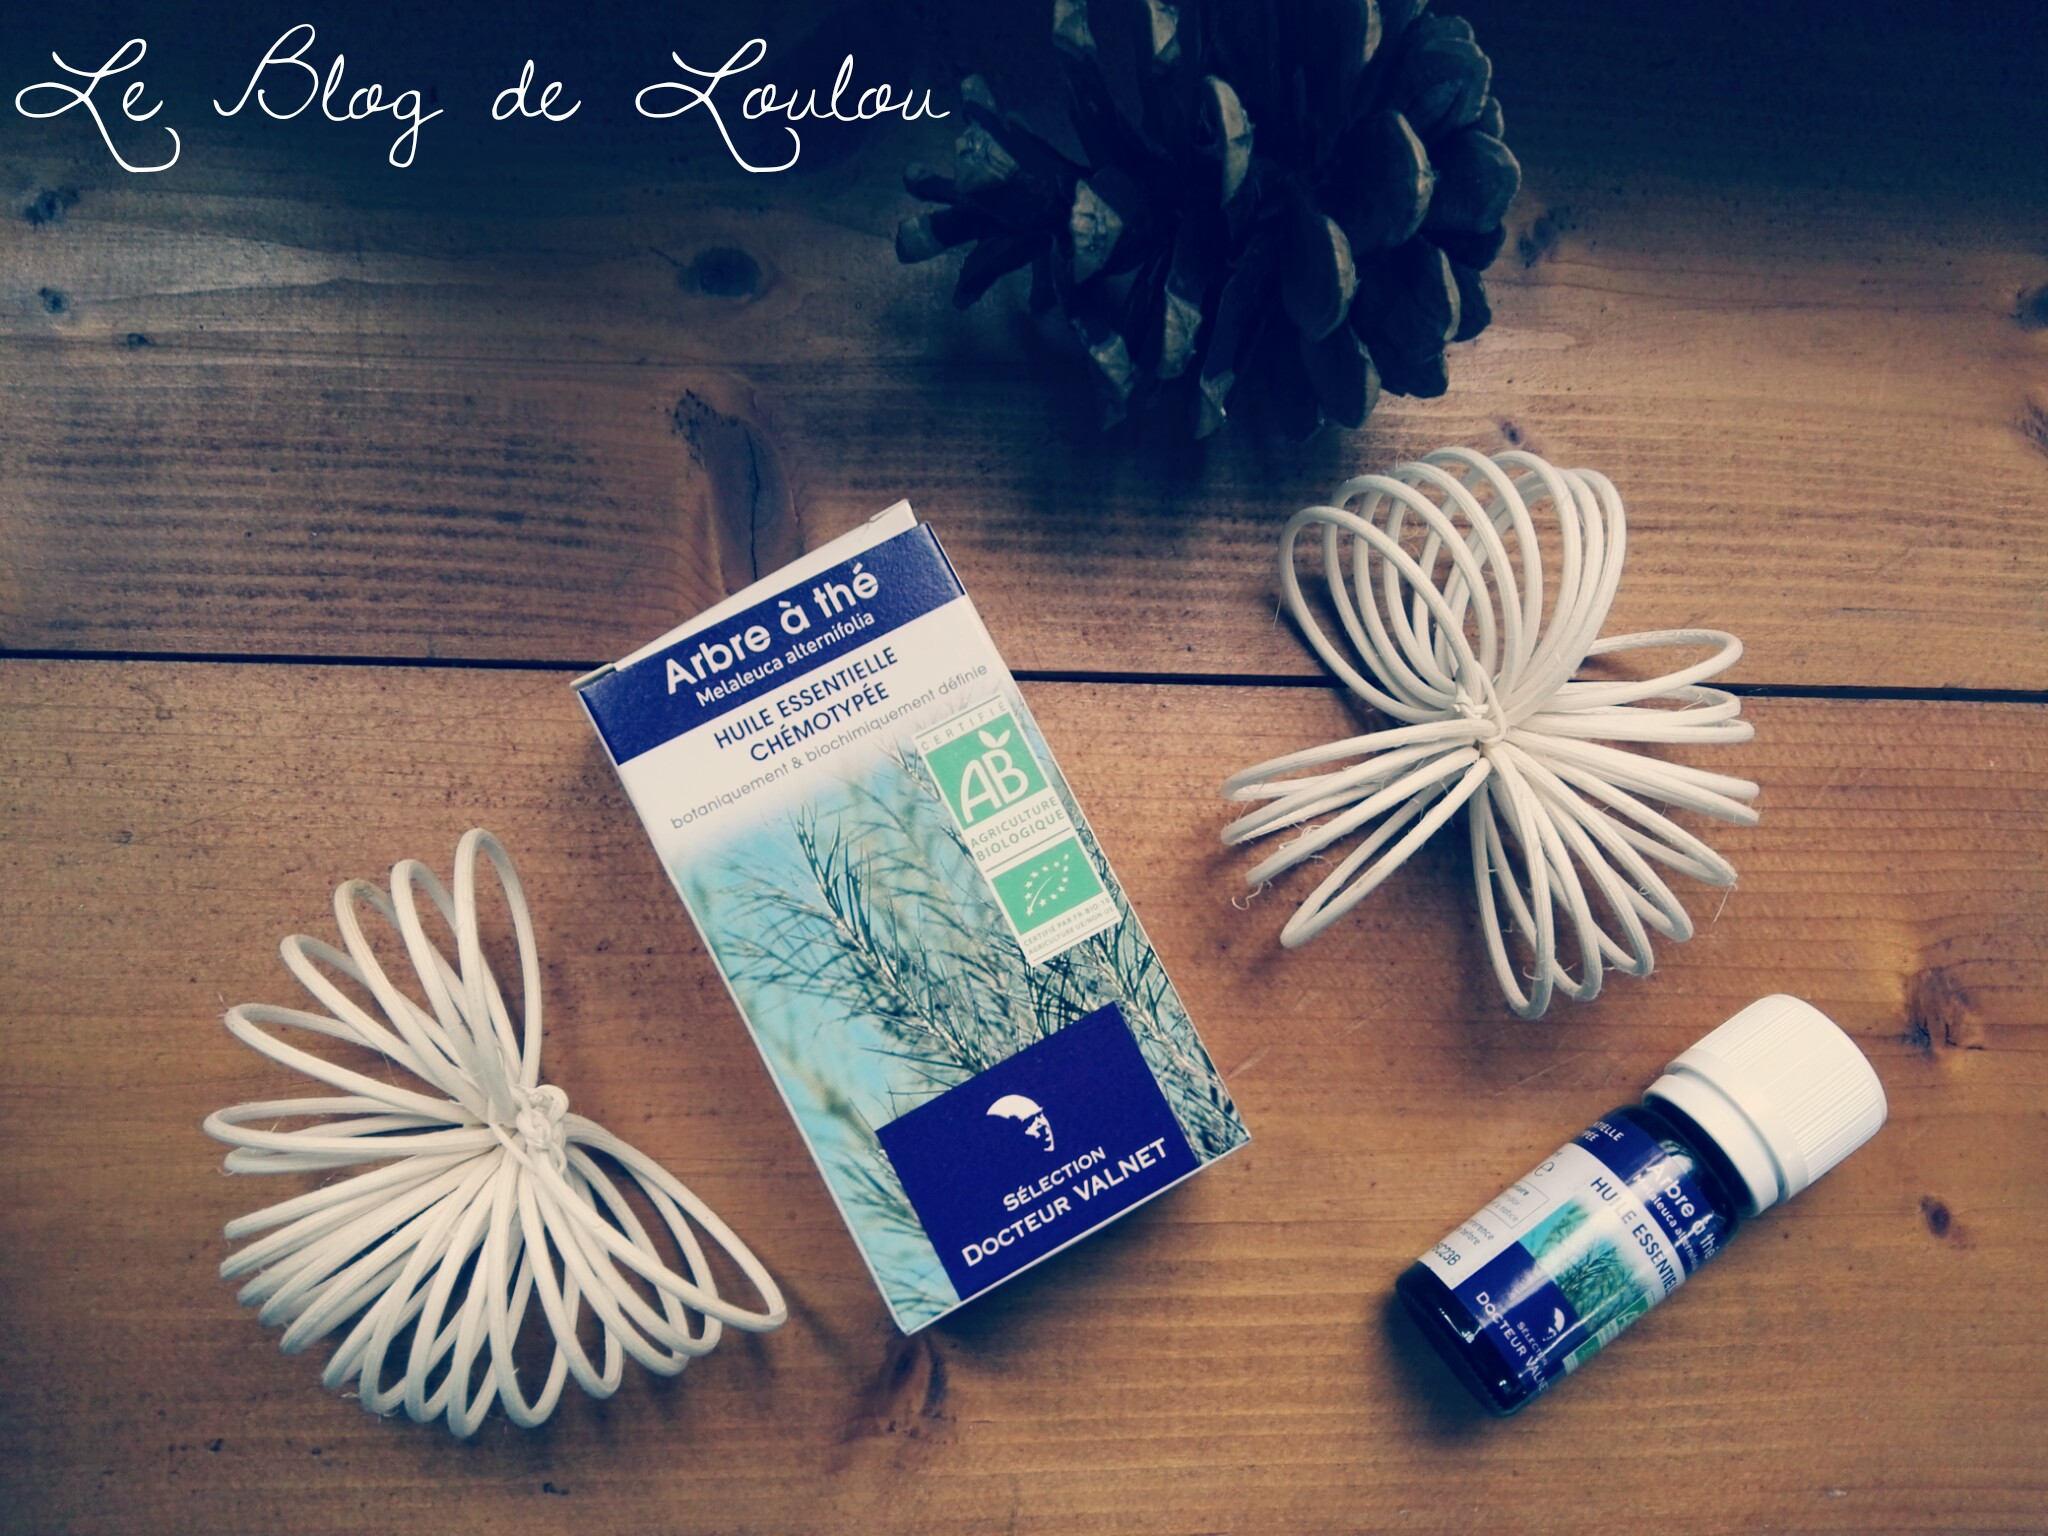 L huile essentielle d arbre th tea tree le blog de - L huile essentielle d arbre a the ...